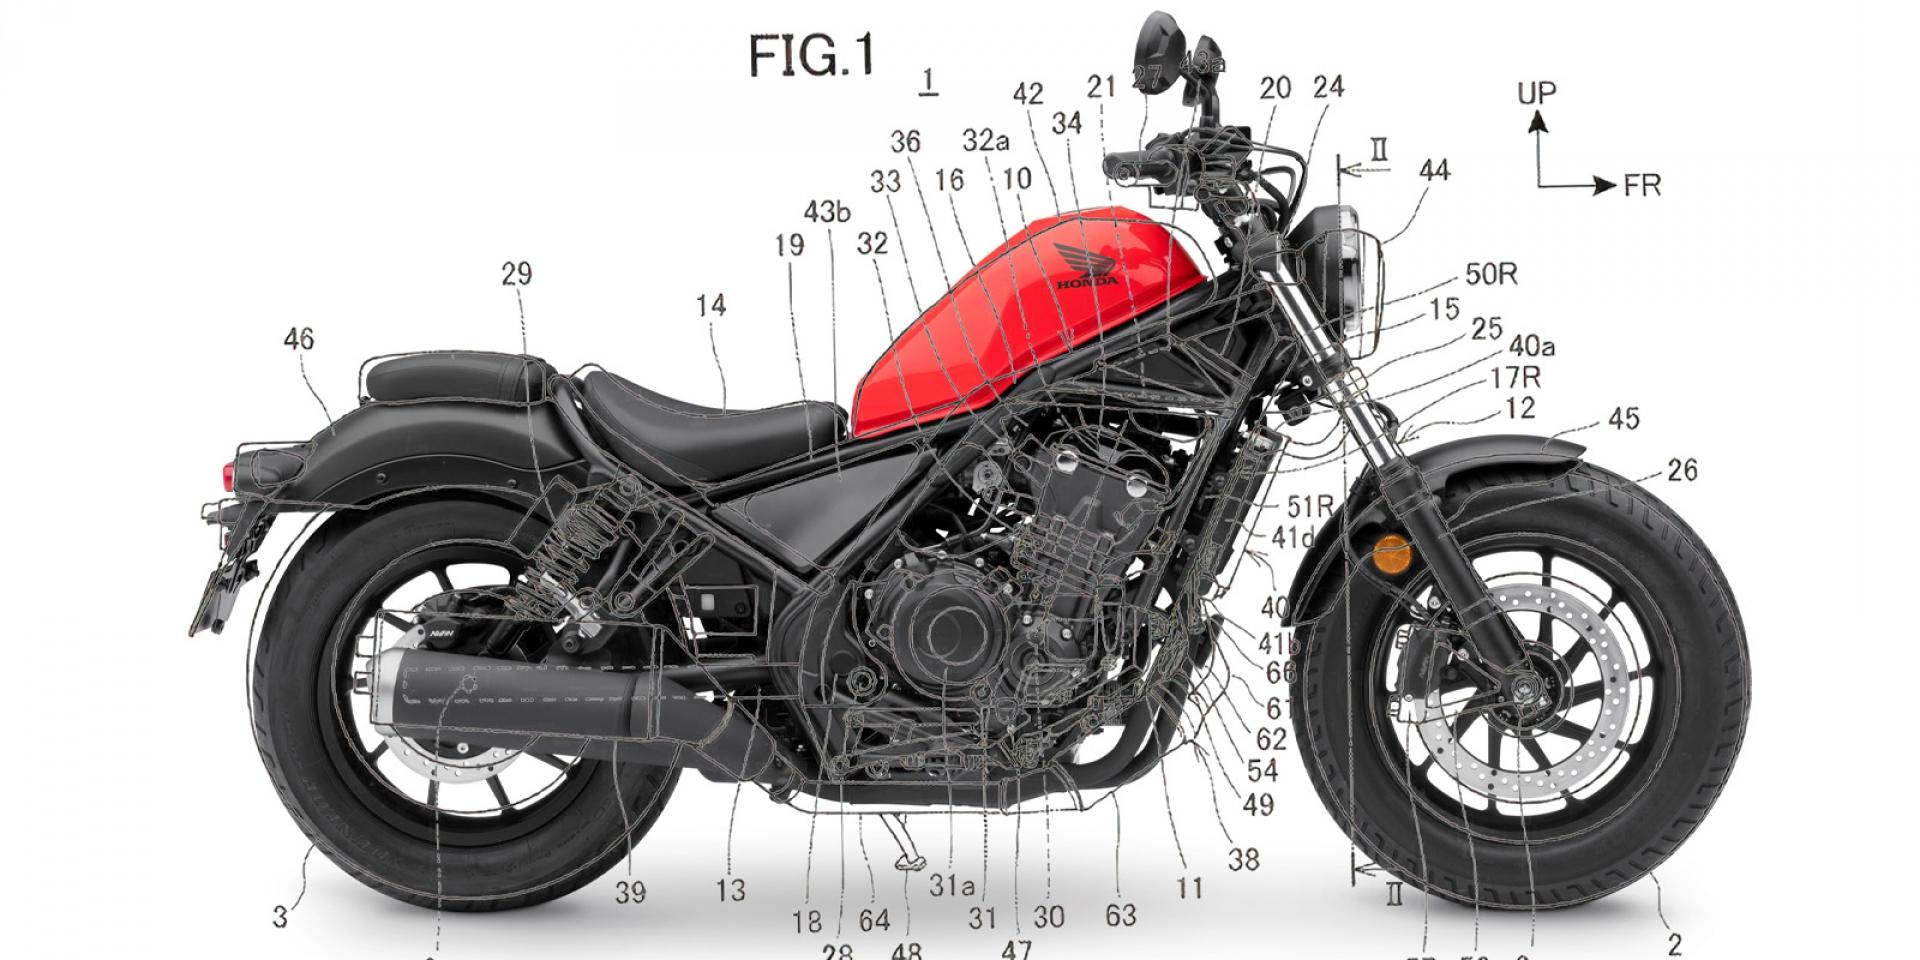 HONDA Rebel 1100準備登場?與AFRICA TWIN共構引擎專利現身!